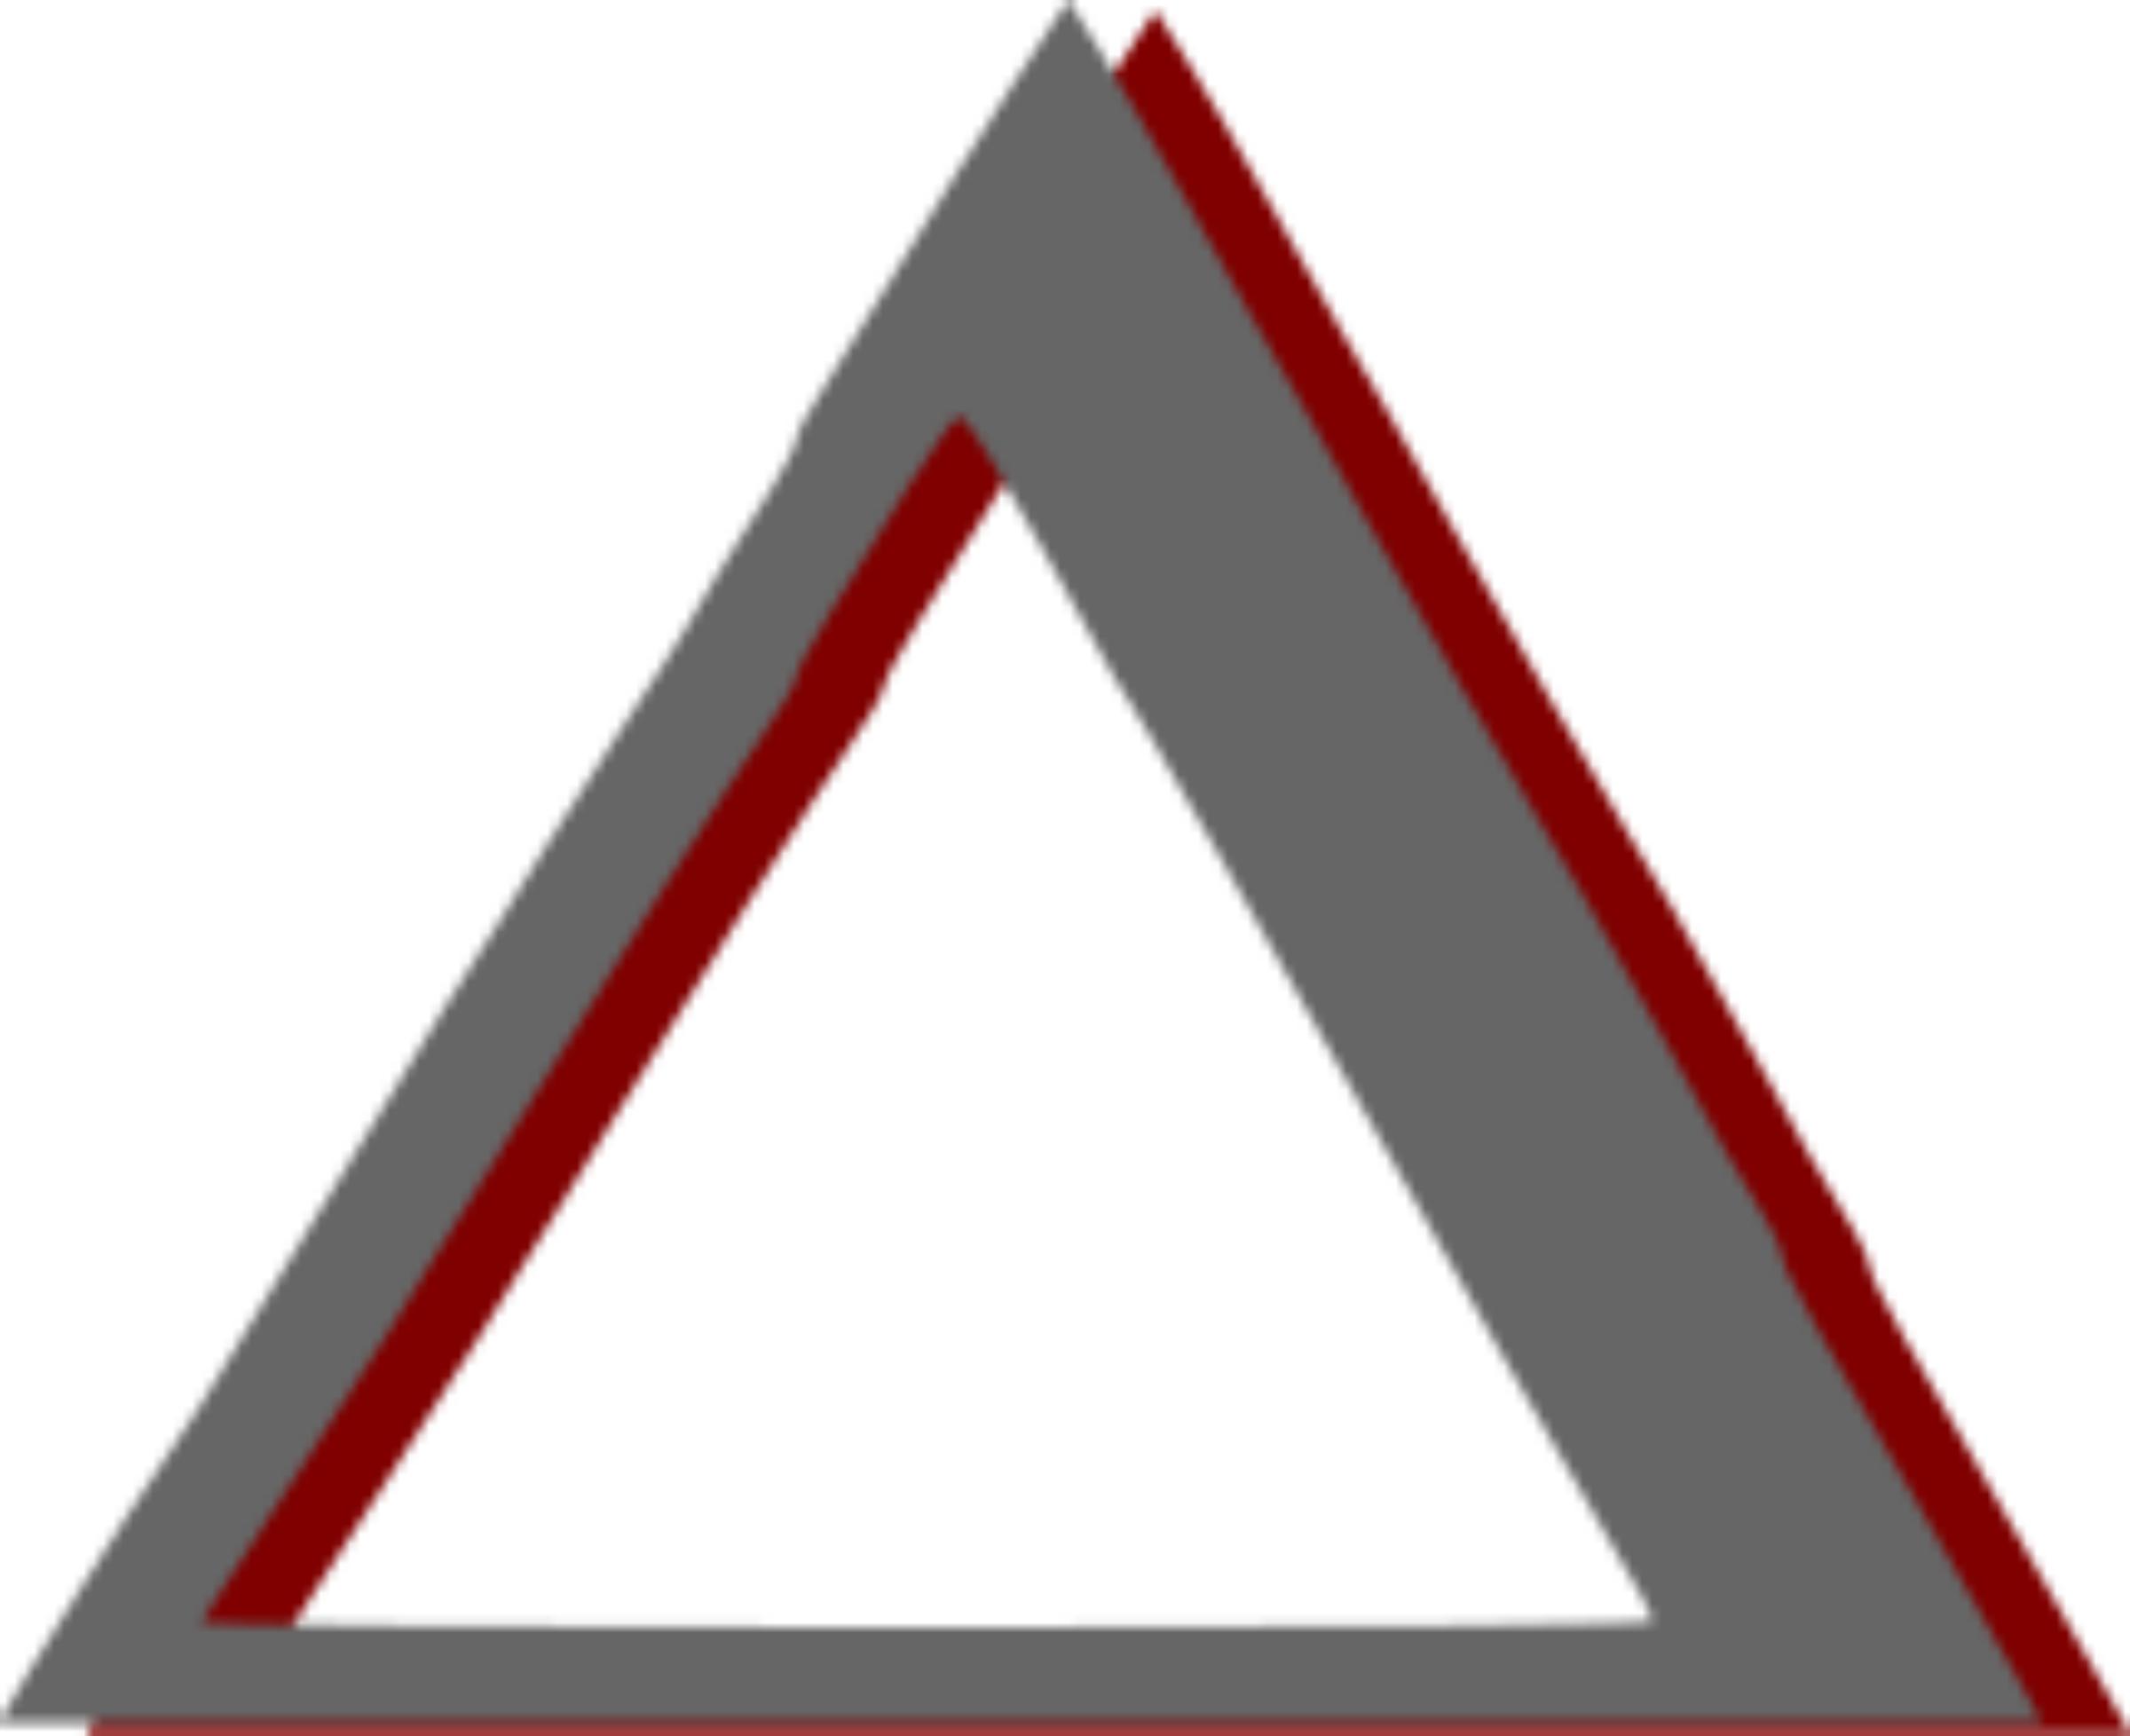 Delta Symbol Vector Clipart Image Free Stock Photo Public Domain